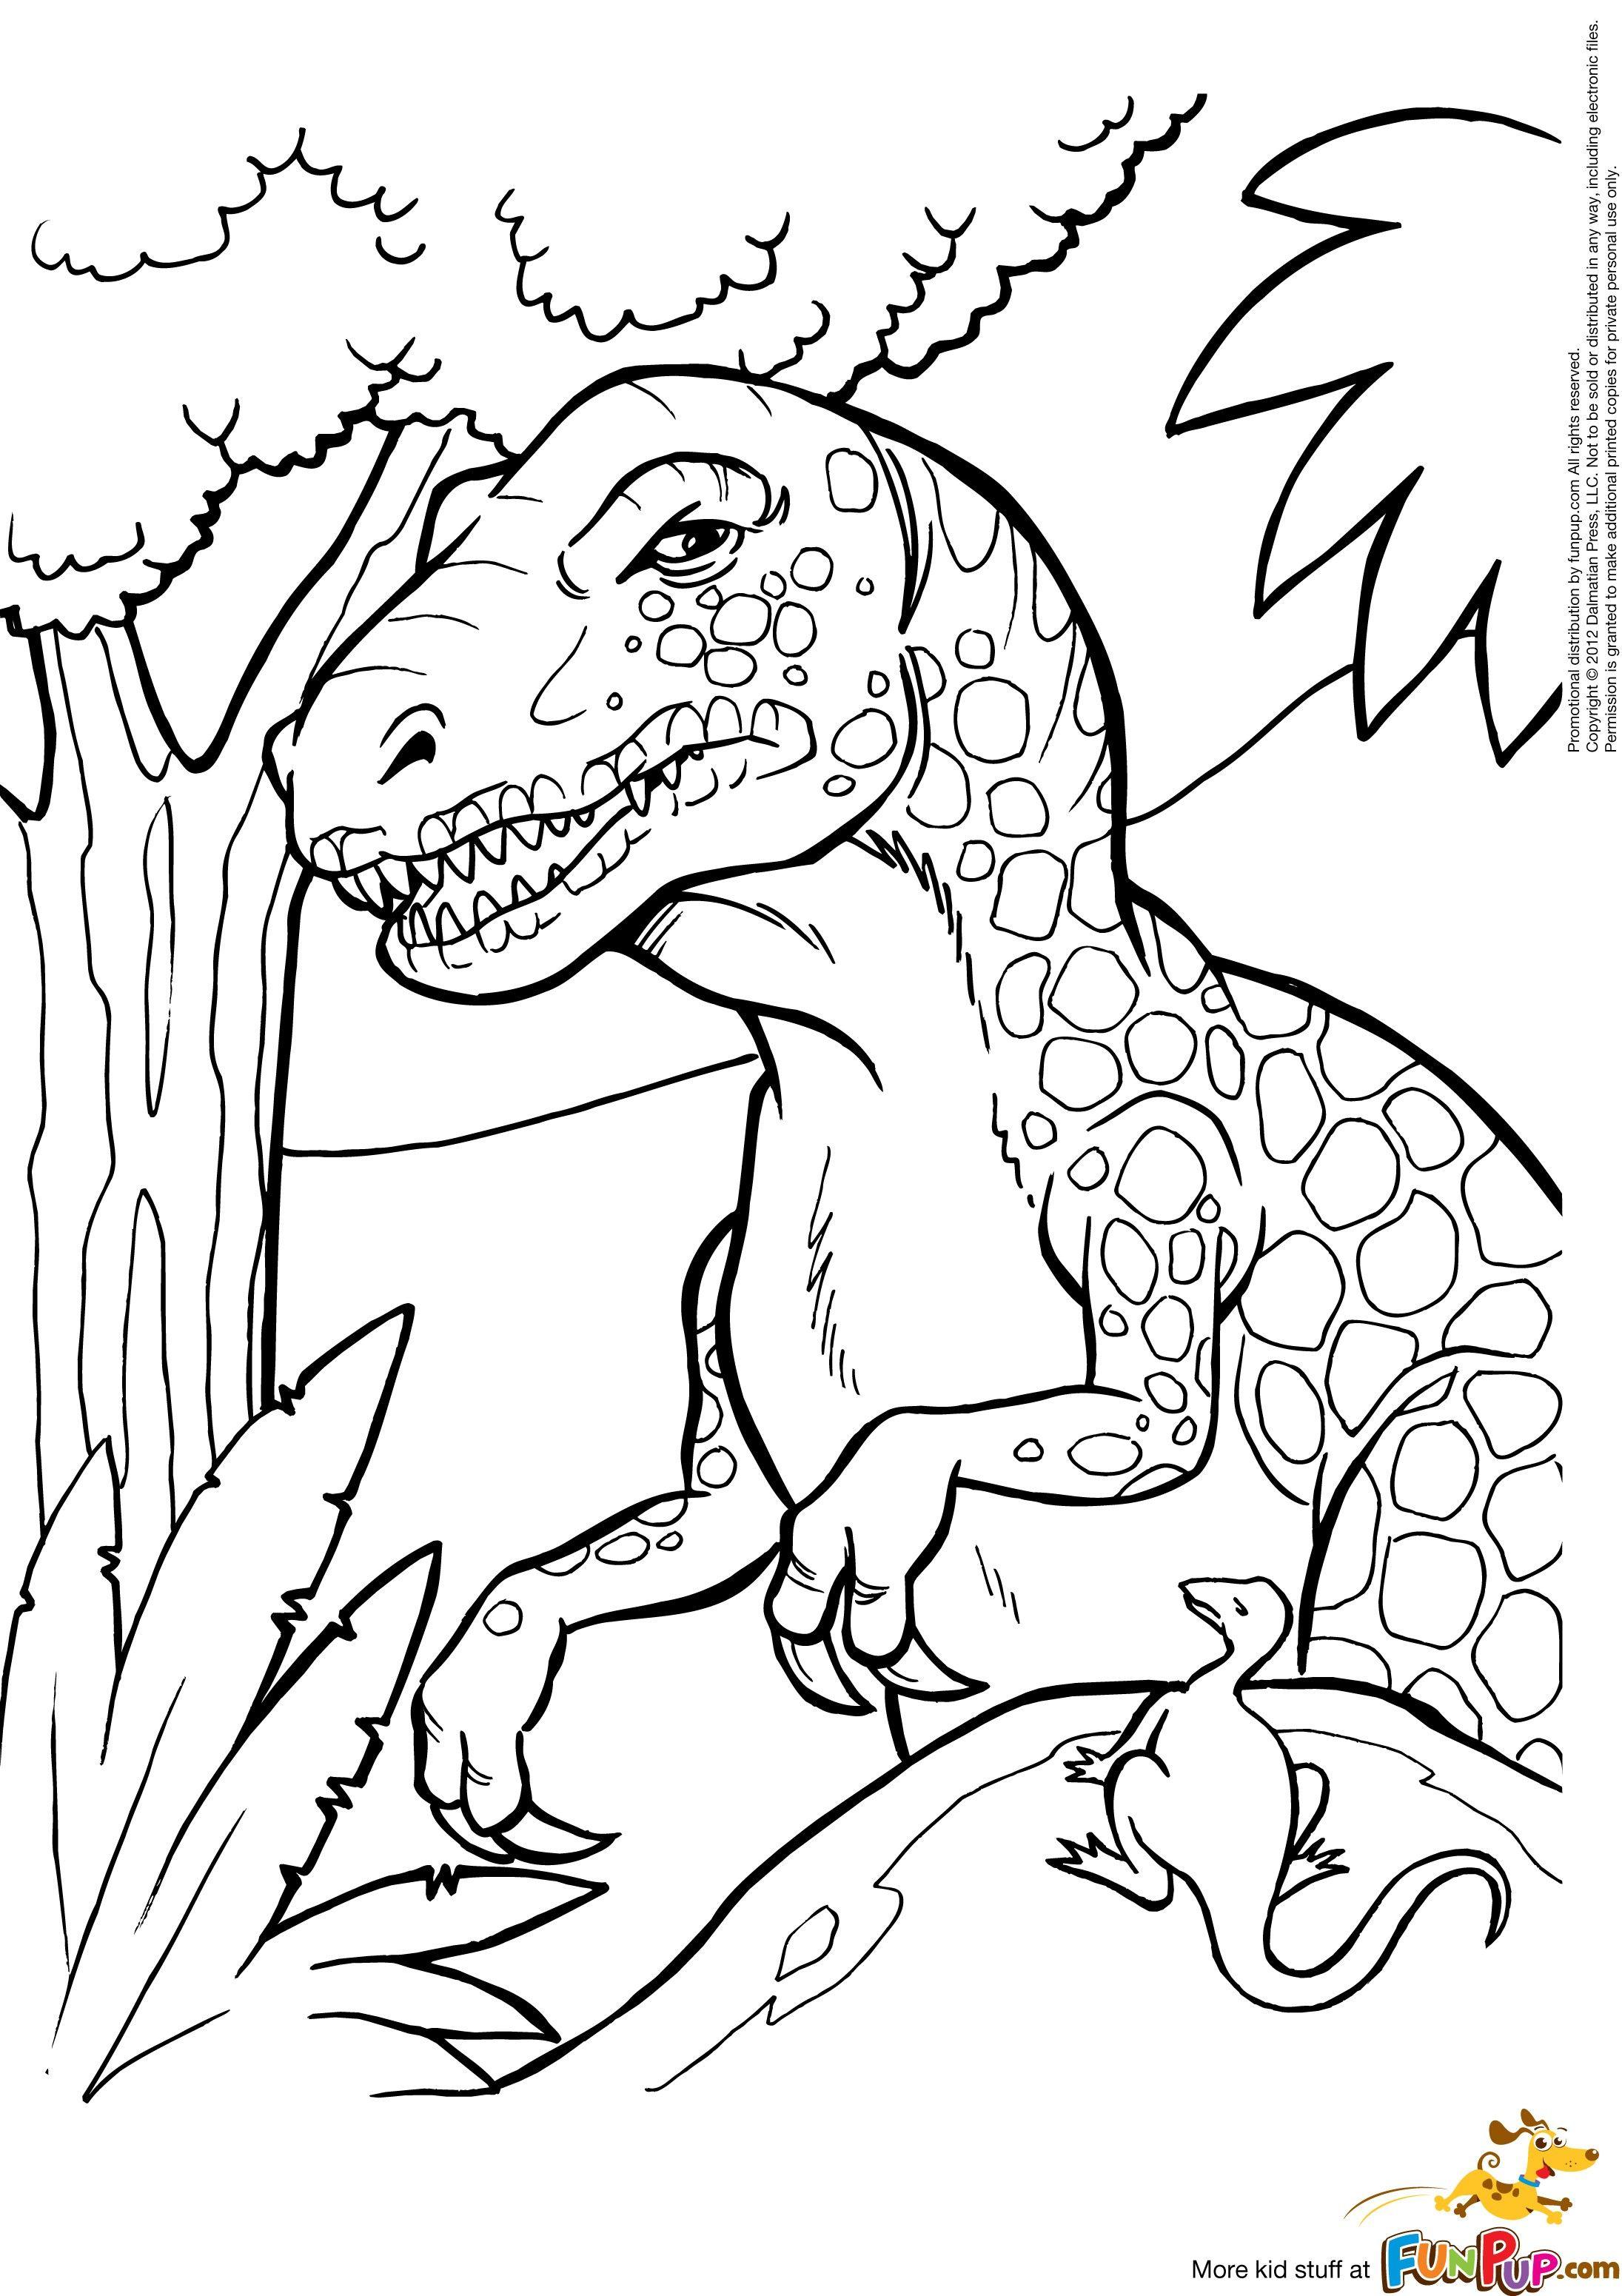 Big T Rex 0 00 Dinosaur Coloring Sheets Dinosaur Coloring Pages Animal Coloring Pages